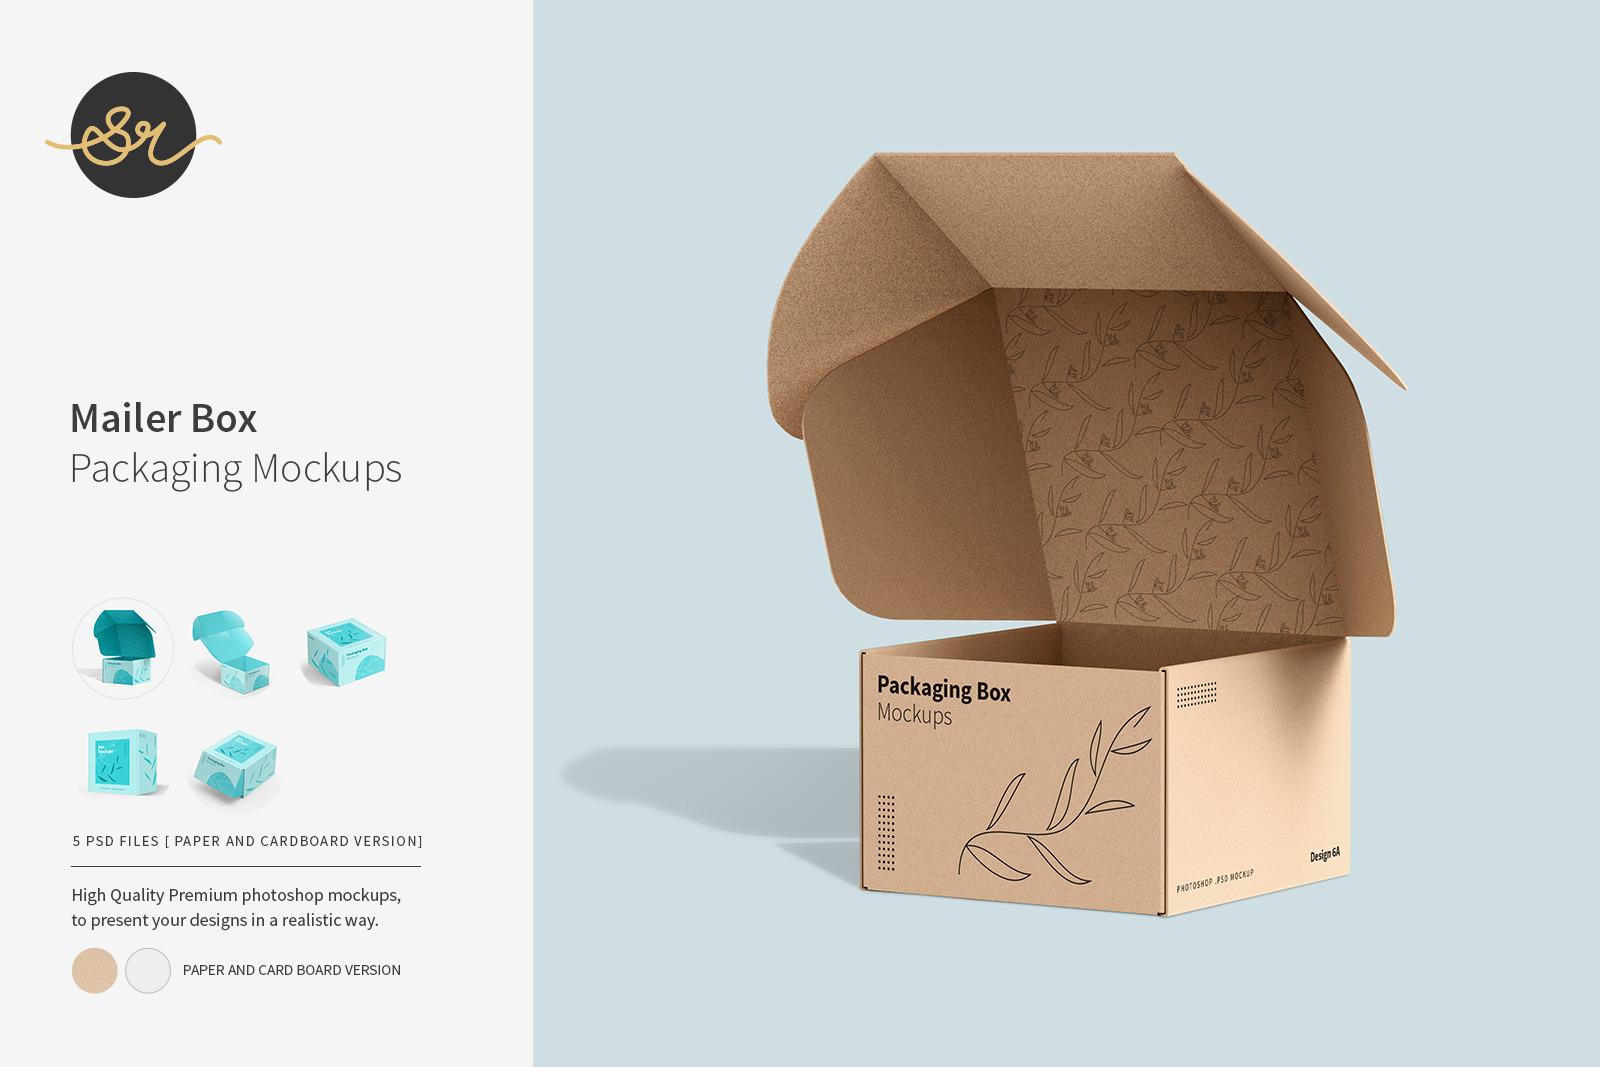 Mailer Box Packaging Mockups